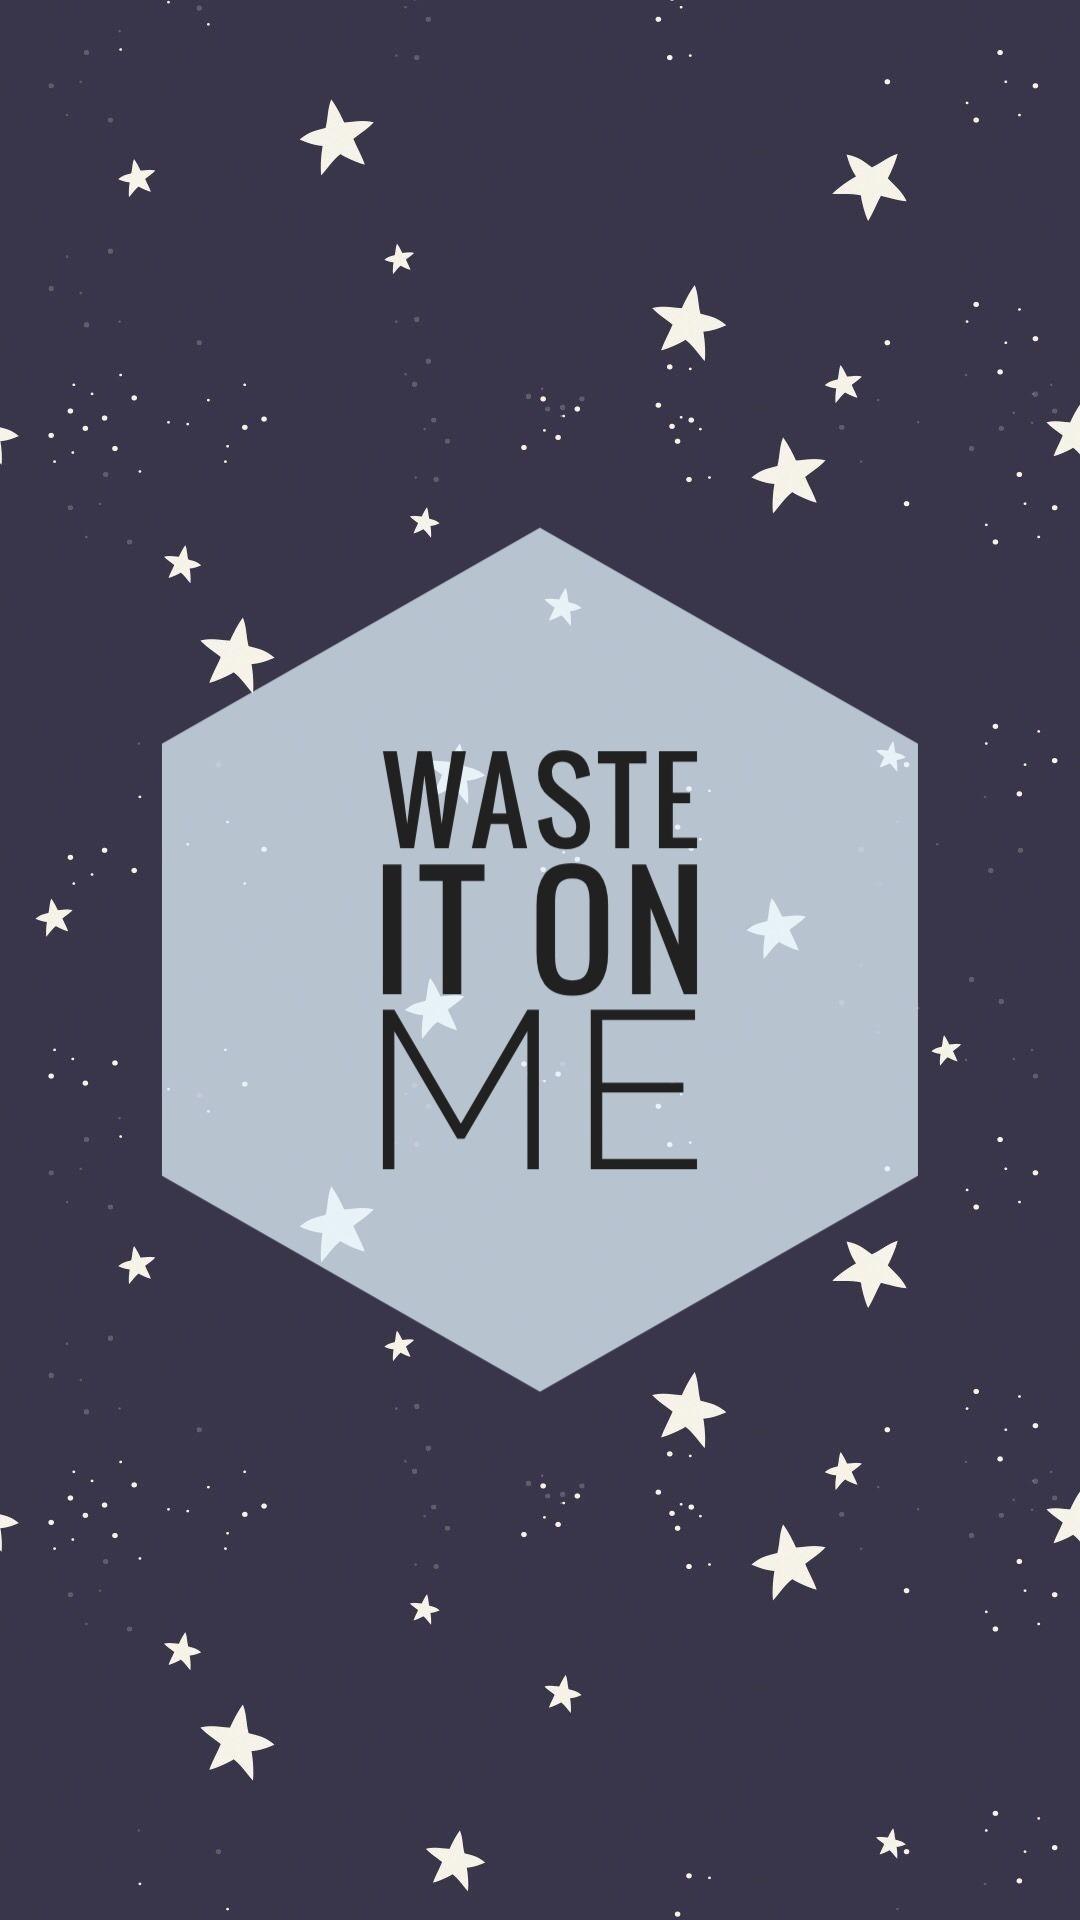 Bts Waste It On Me Lyric Wallpapers Bts Waste It On Me 452900